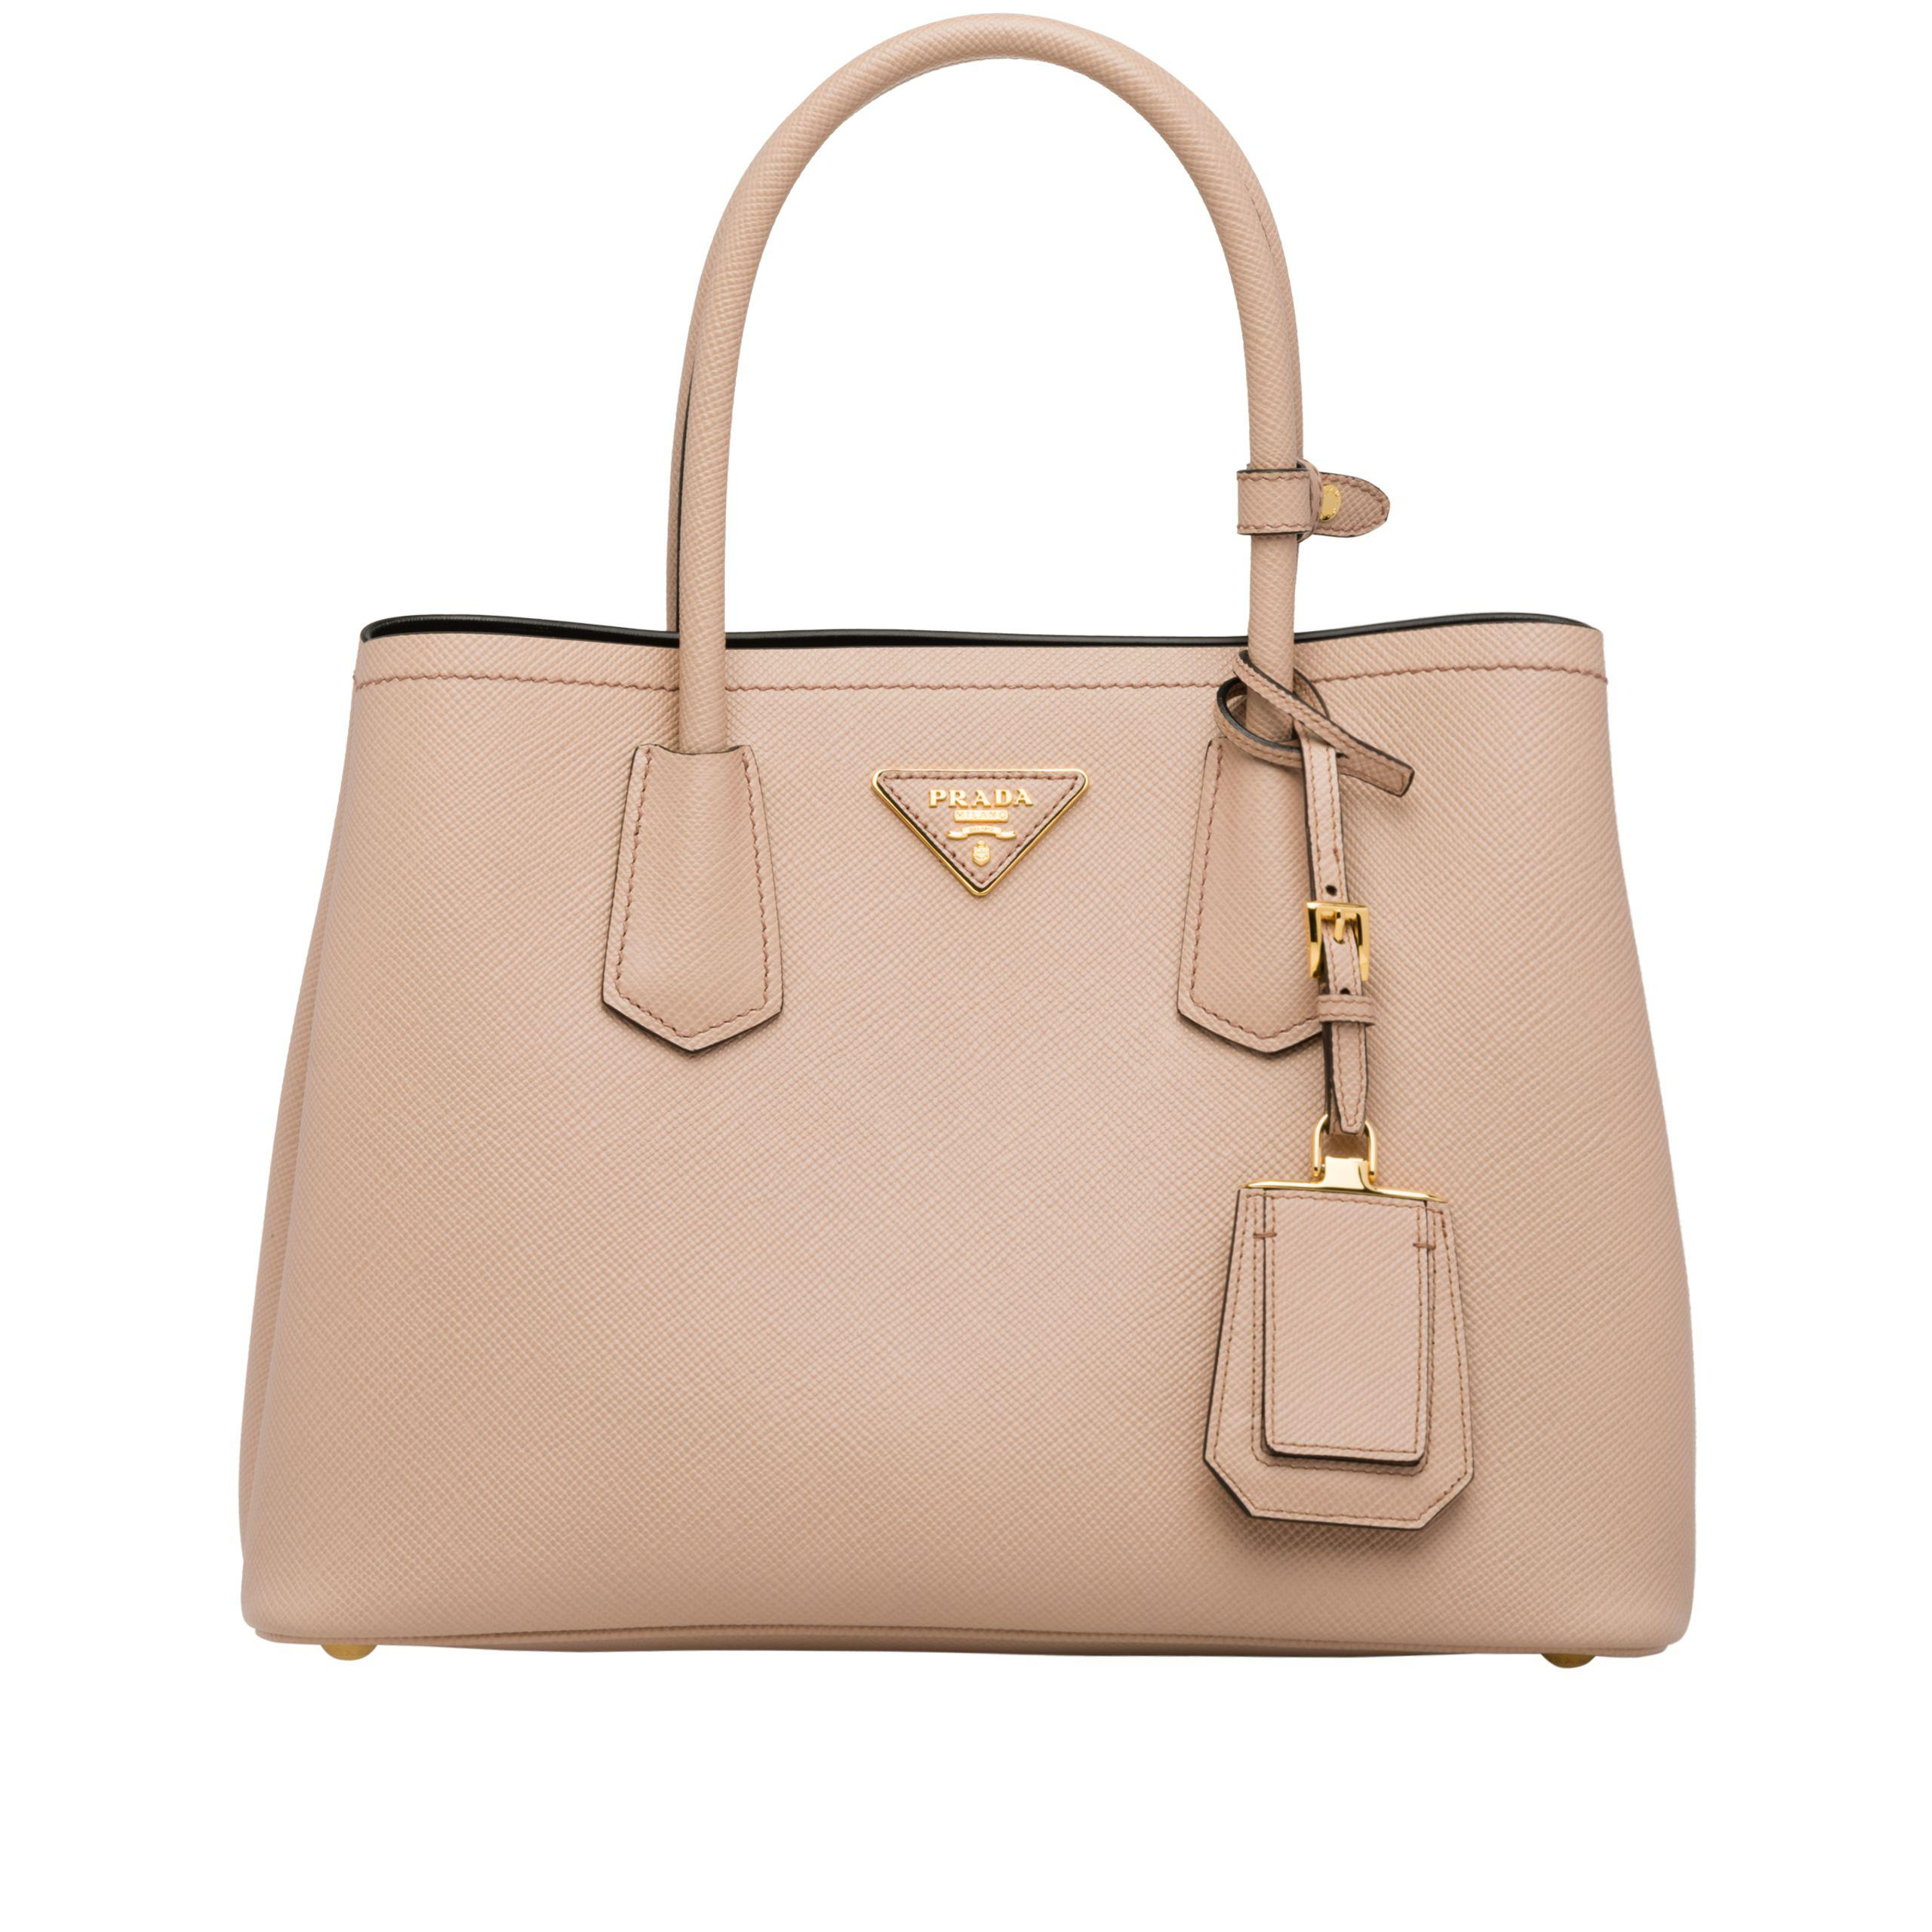 dce9daf16555 Prada - Natural Double Small Bag - Lyst. View fullscreen